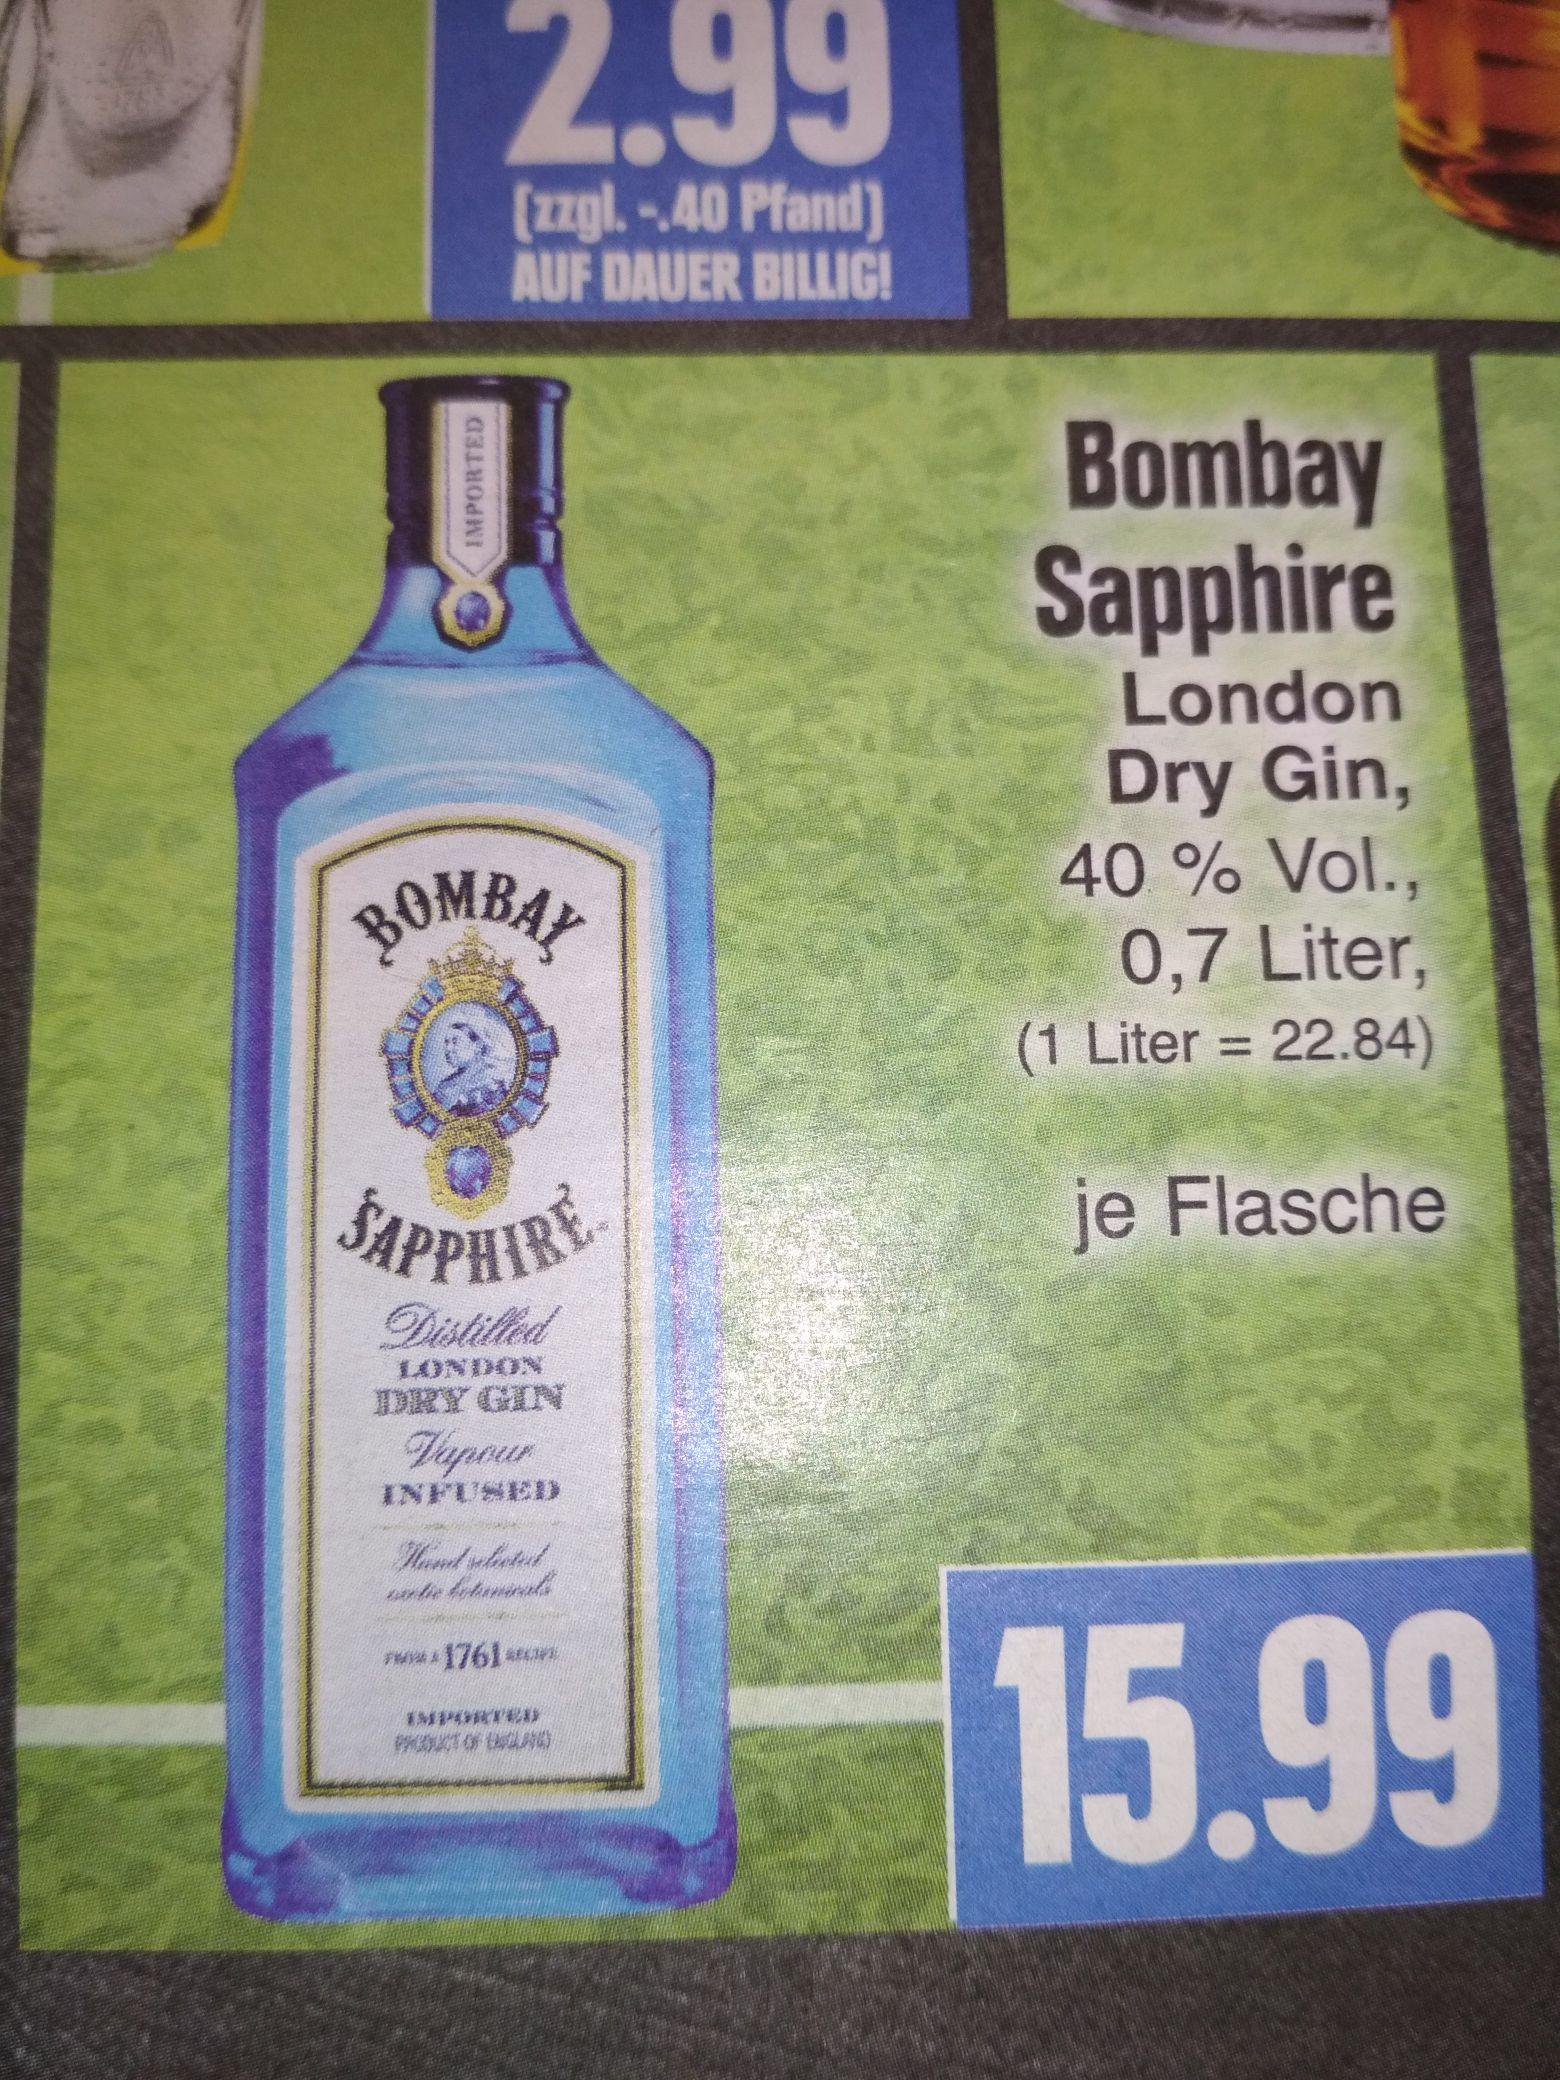 Edeka/Ratio/Marktkauf - Bombay Sapphire London Dry Gin 0,7 l